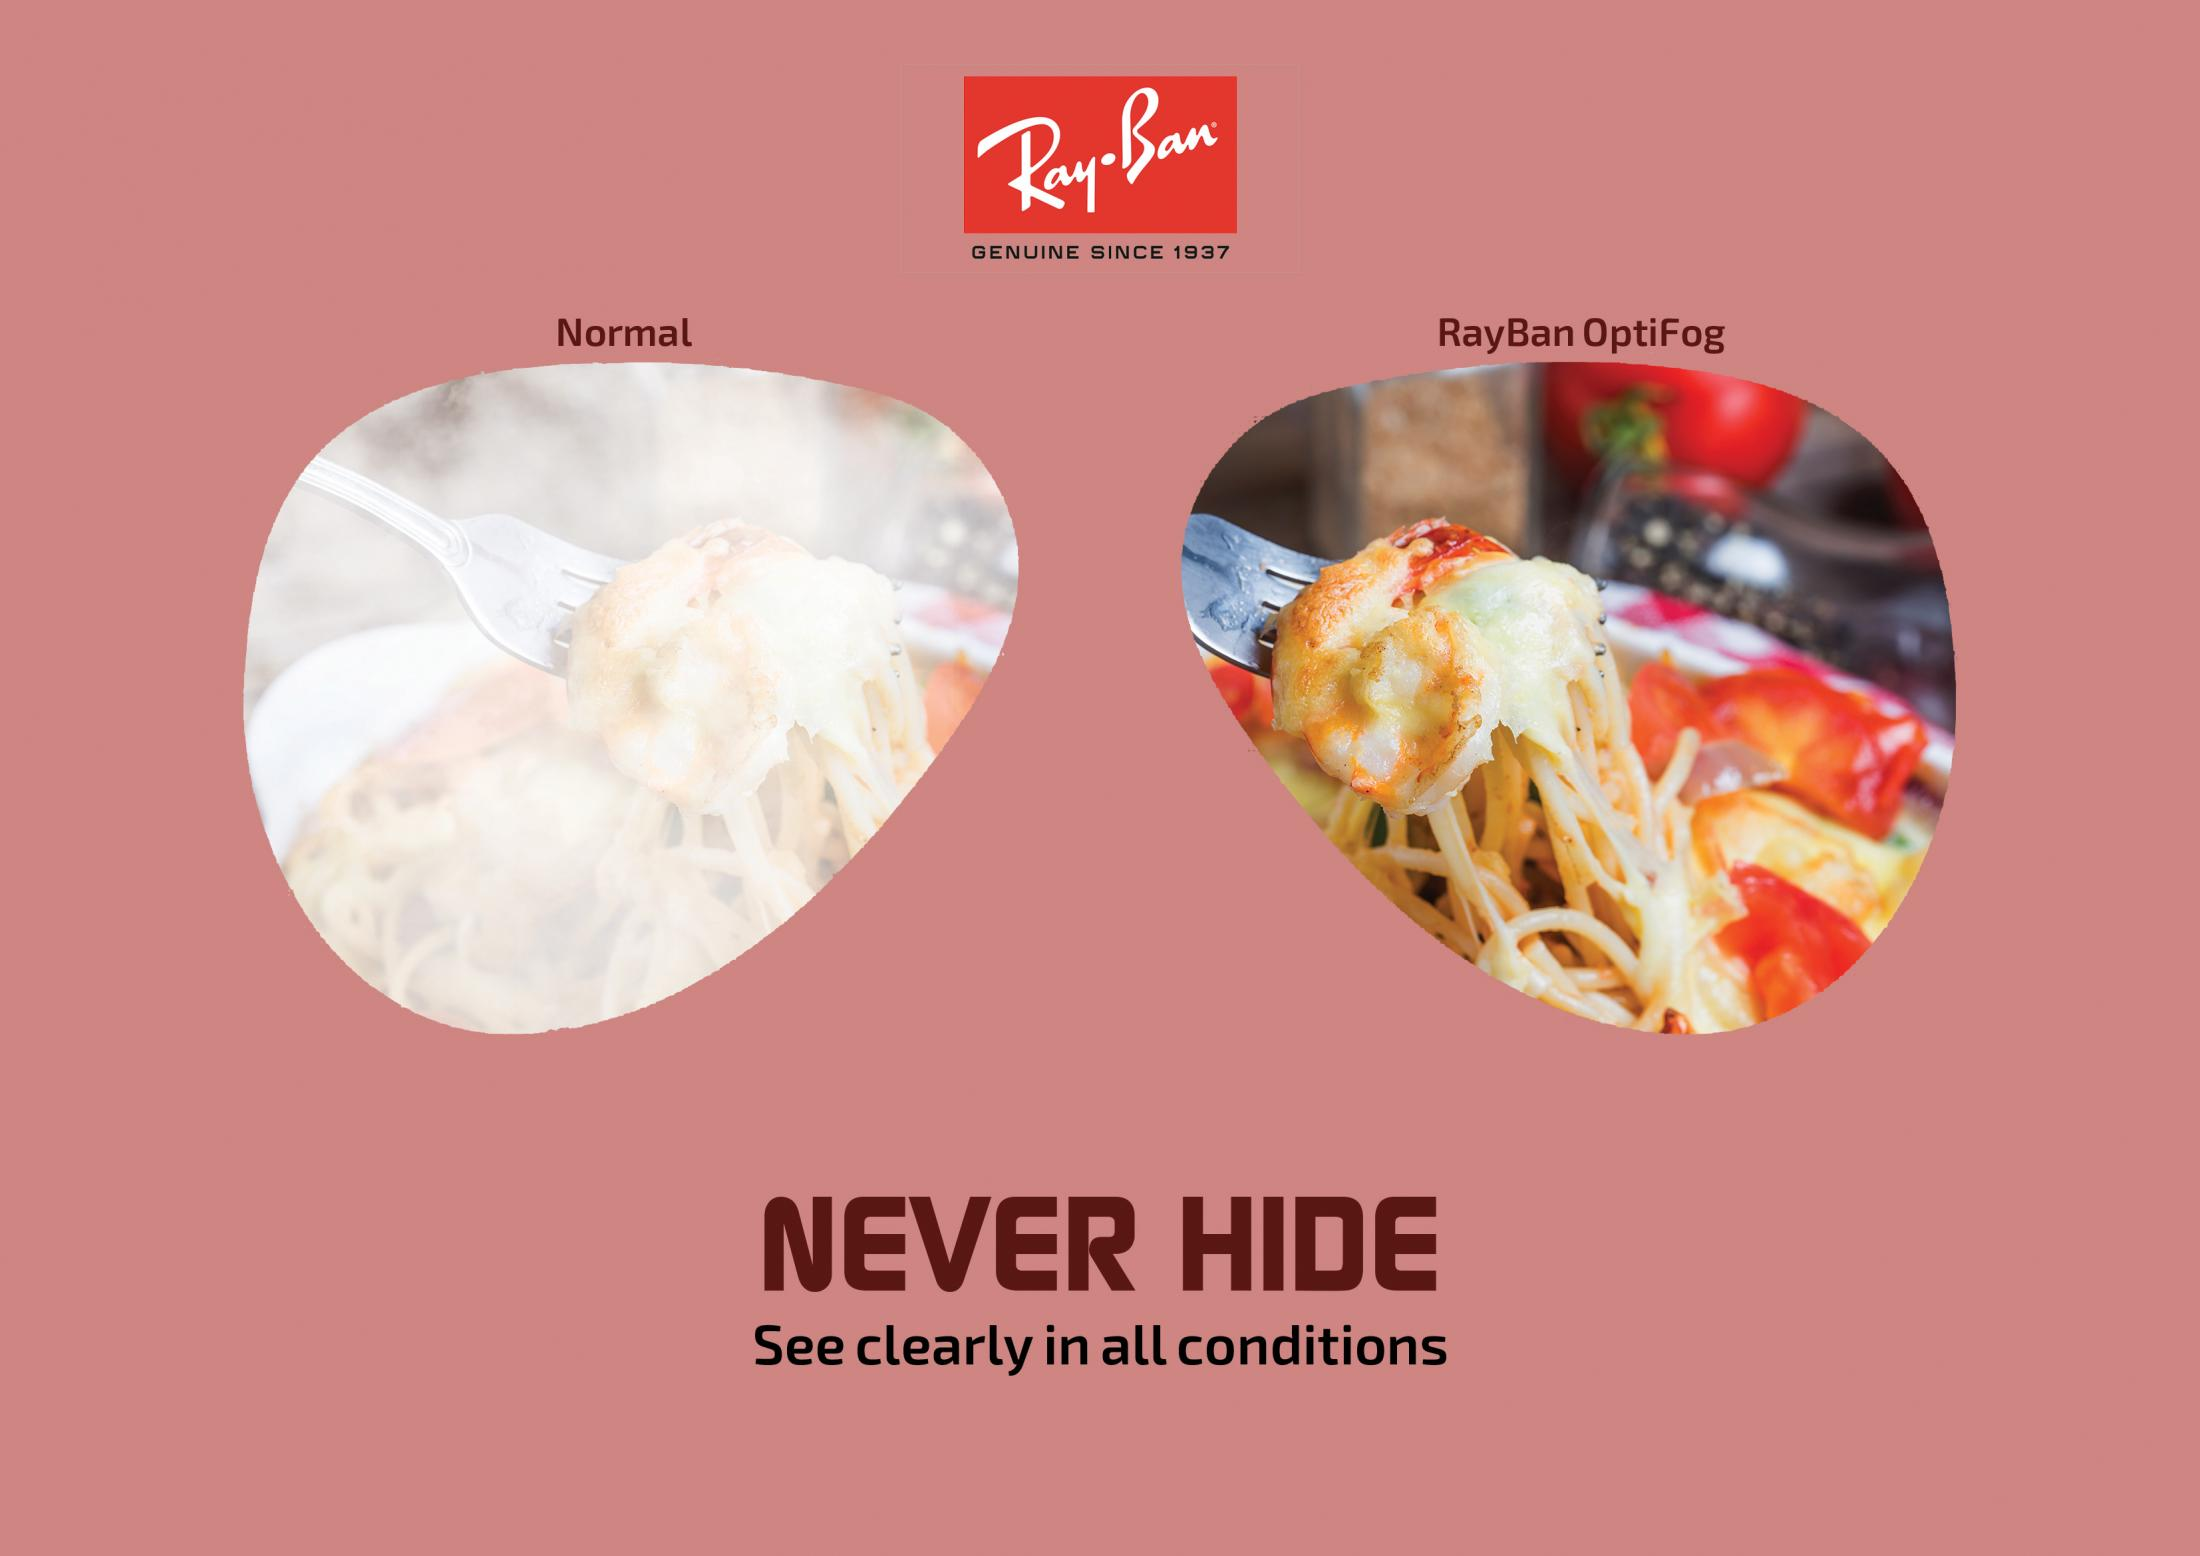 Ray-Ban Print Ad - Never Hide, 3